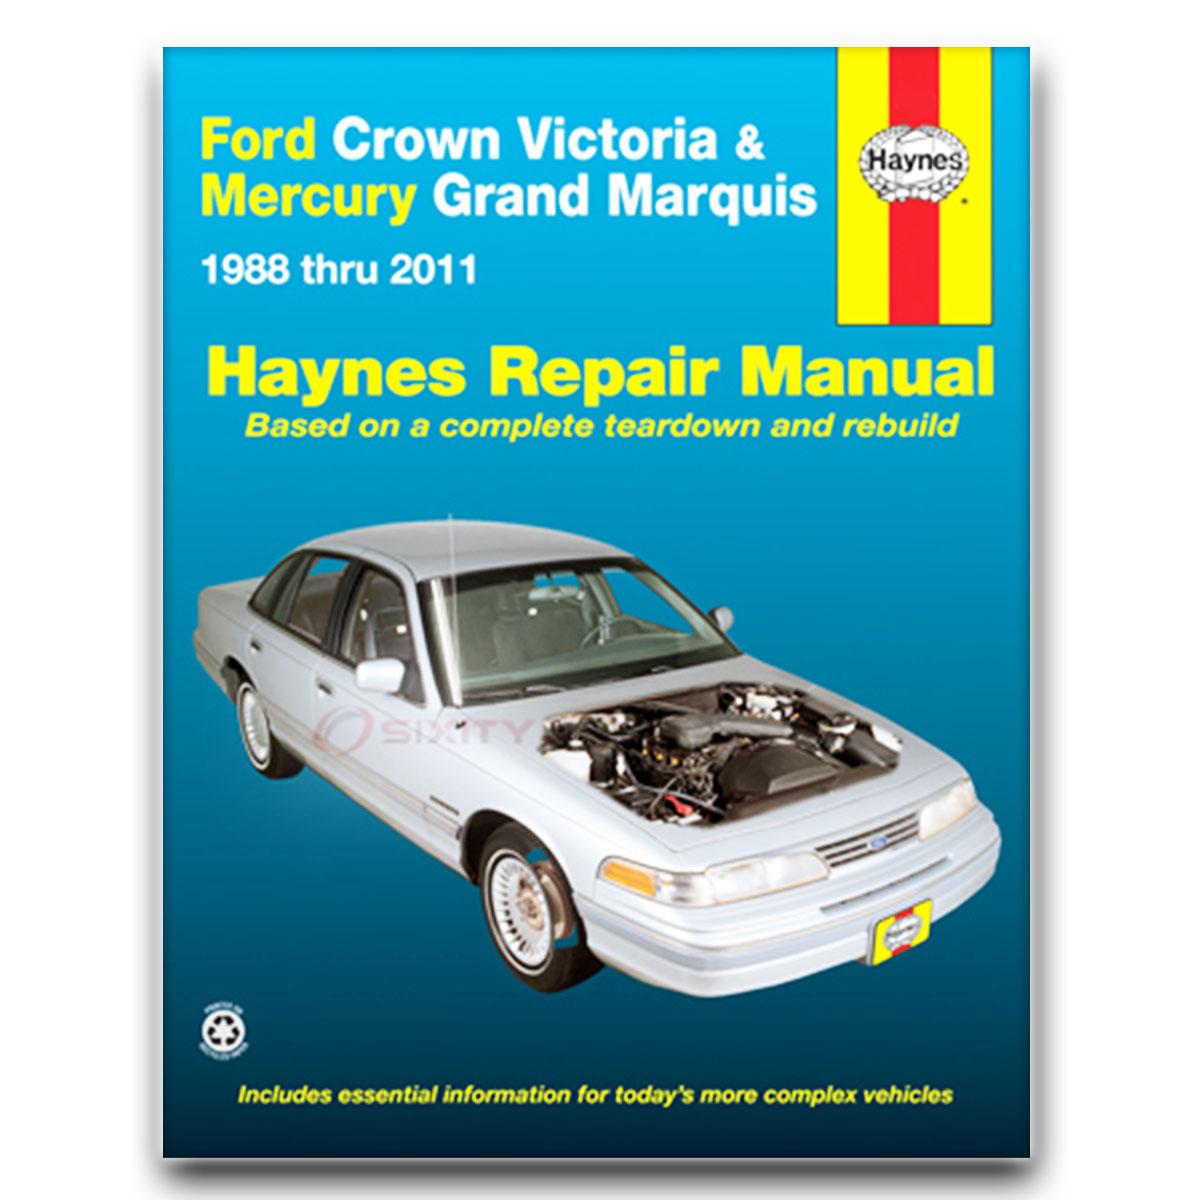 Haynes Repair Manual for Ford Crown Victoria Special Edition Base LX Sport  ke